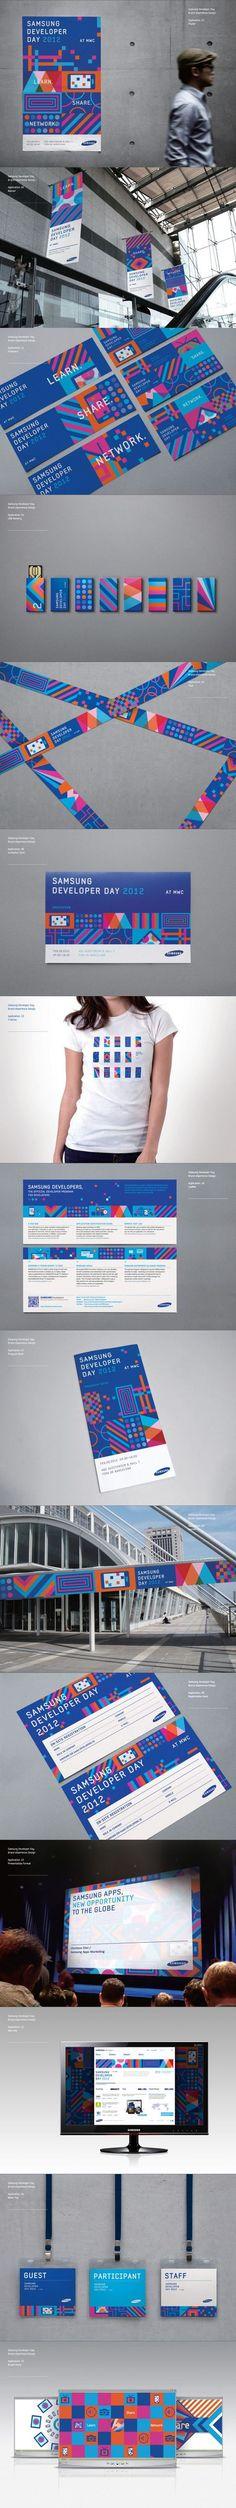 samsung developers brand experience design: